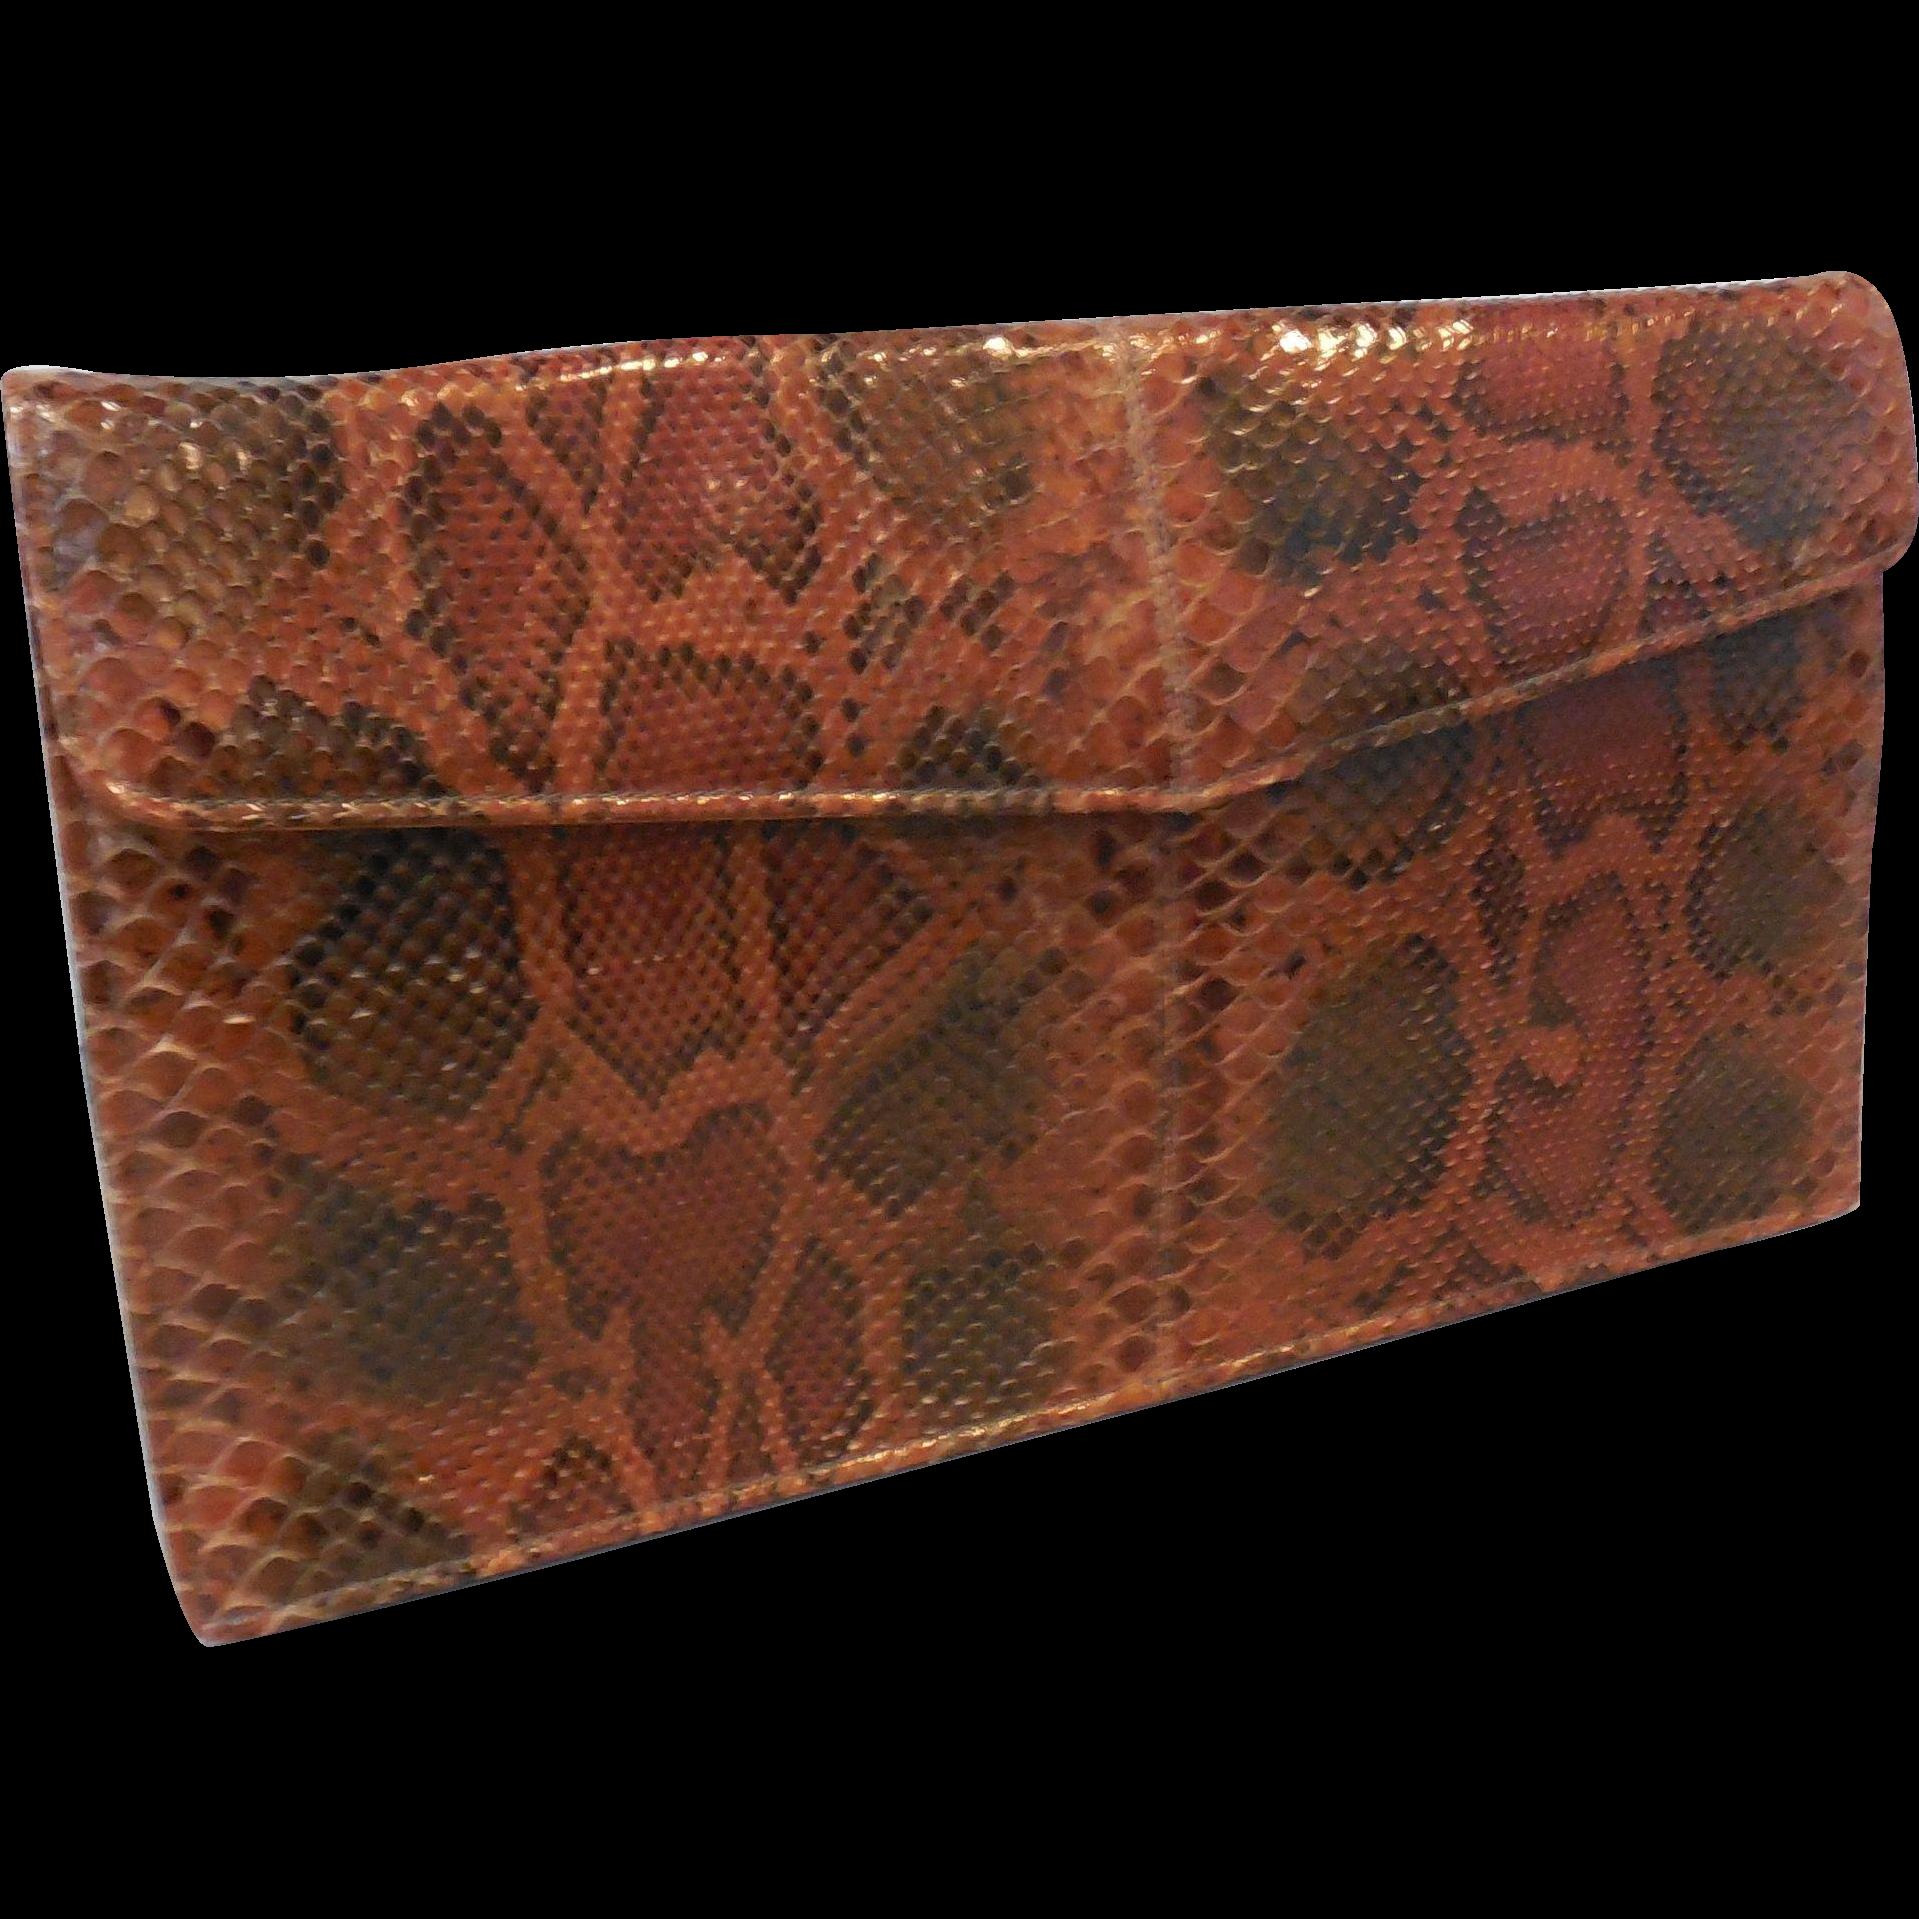 Vintage New Unused Clutch Handbag Purse in Rust Brown Black Python Snakeskin.